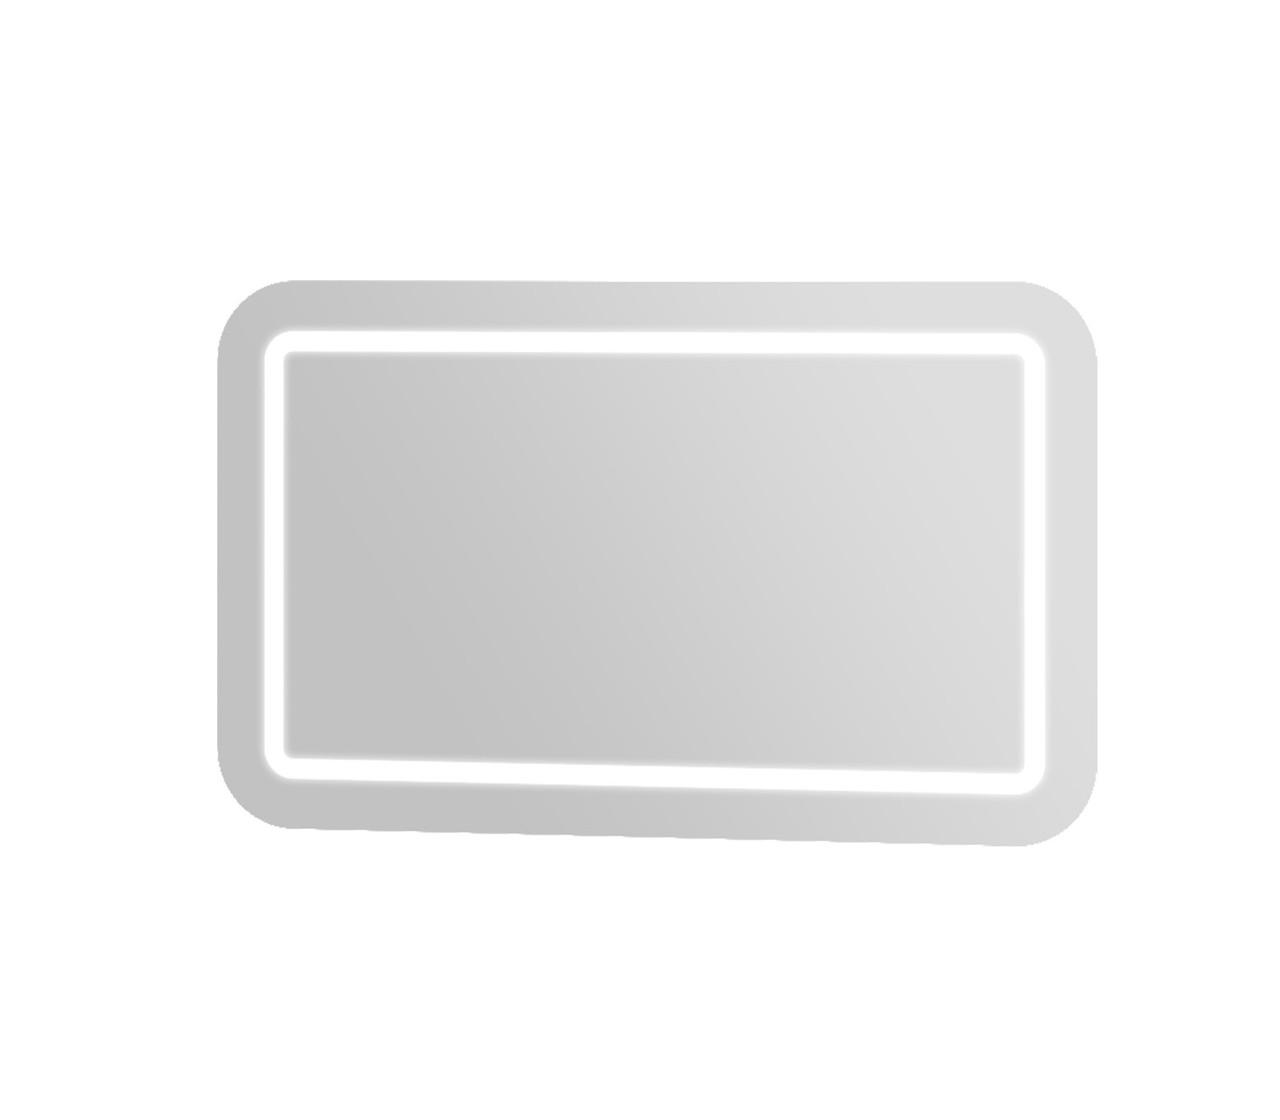 Зеркало с подсветкой JUVENTA Arizona ArM-90